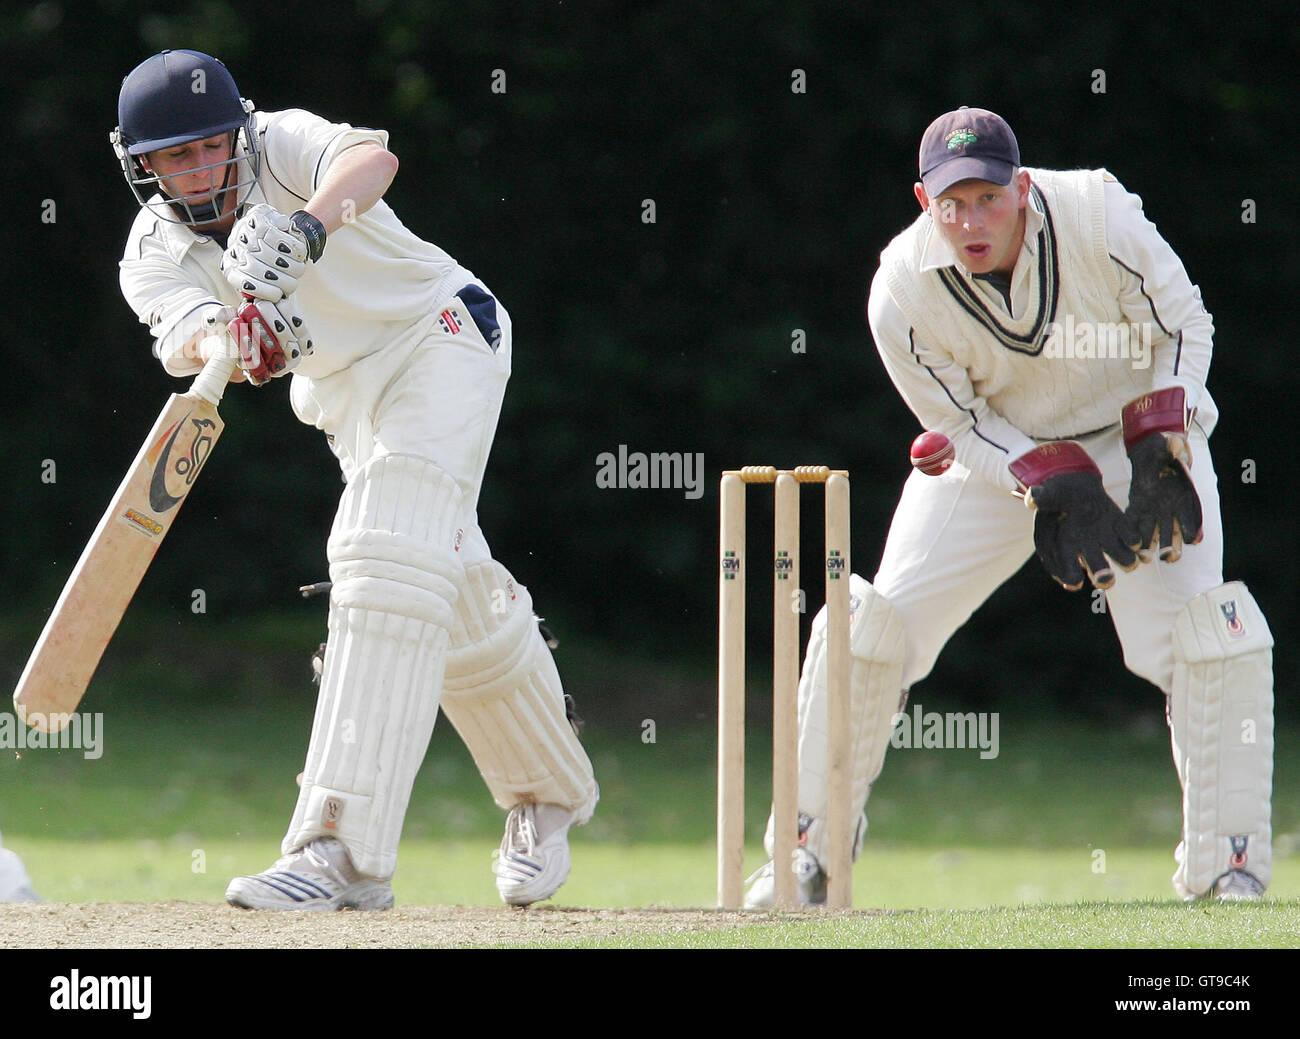 J Walton of Shenfield in batting action - Shenfield CC vs Orsett CC - Essex Cricket League - 07/07/07 Stock Photo